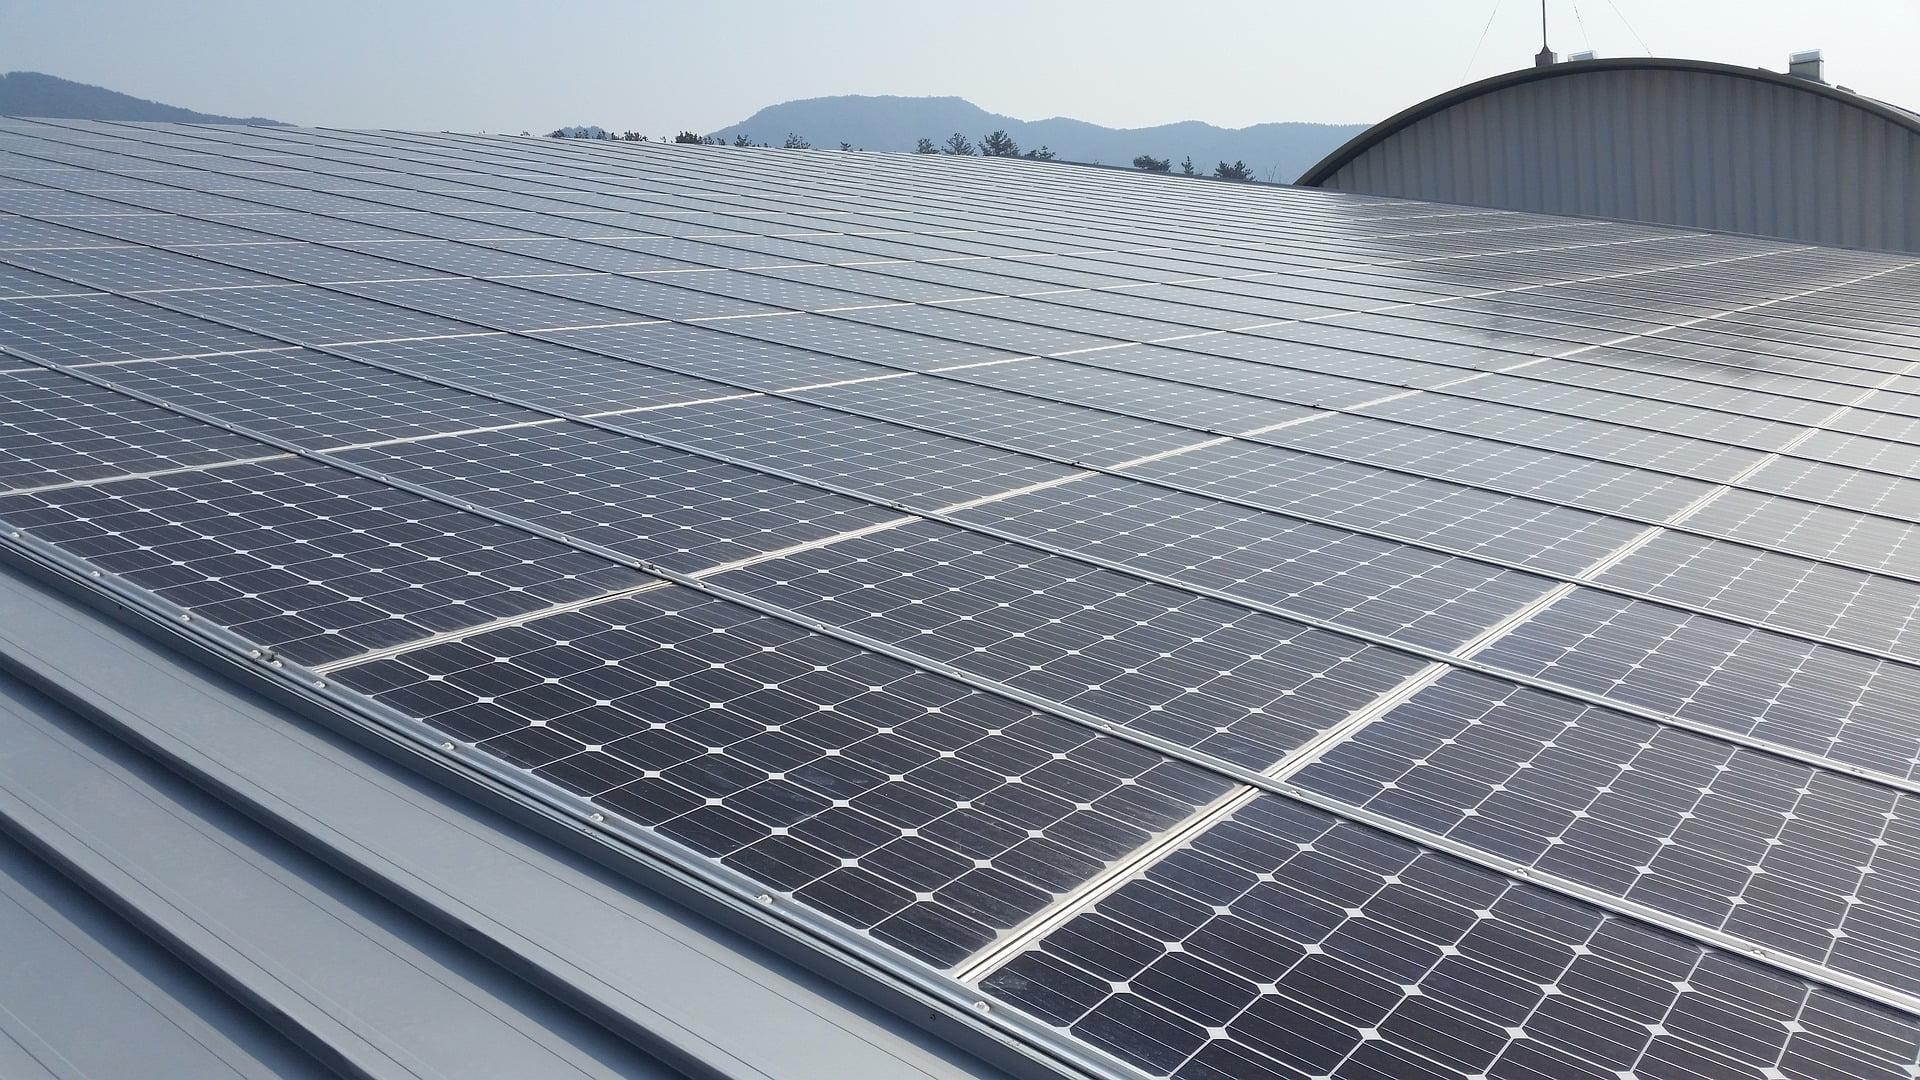 energetika projekt solar-2376233_1920